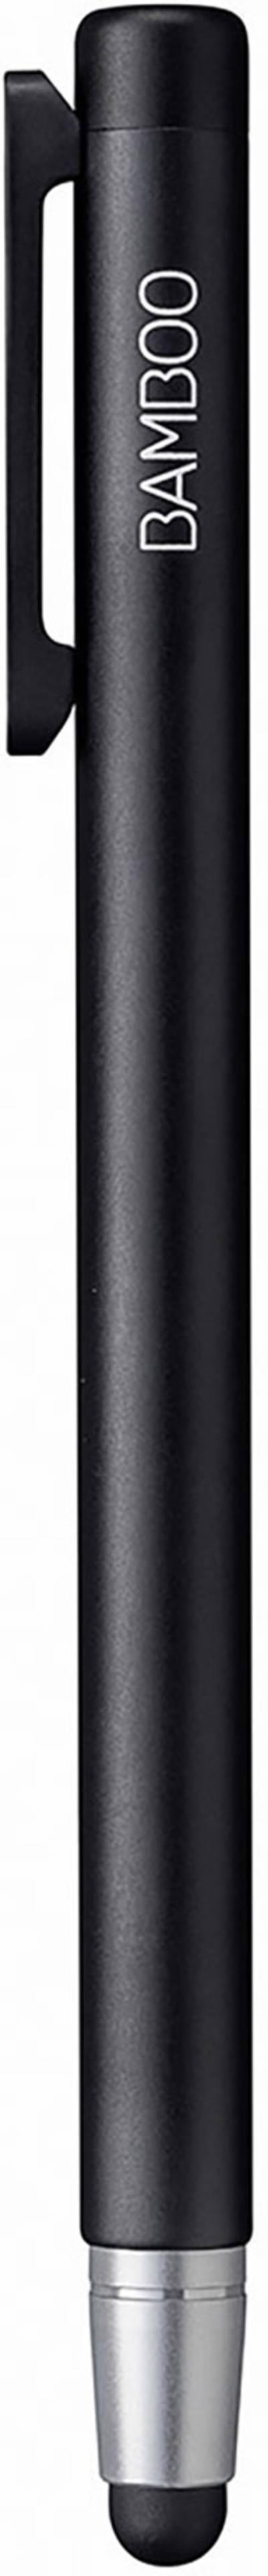 Image of Wacom Bamboo Stylus Alpha 2 Touchpen + pressure-sensitive tip Black